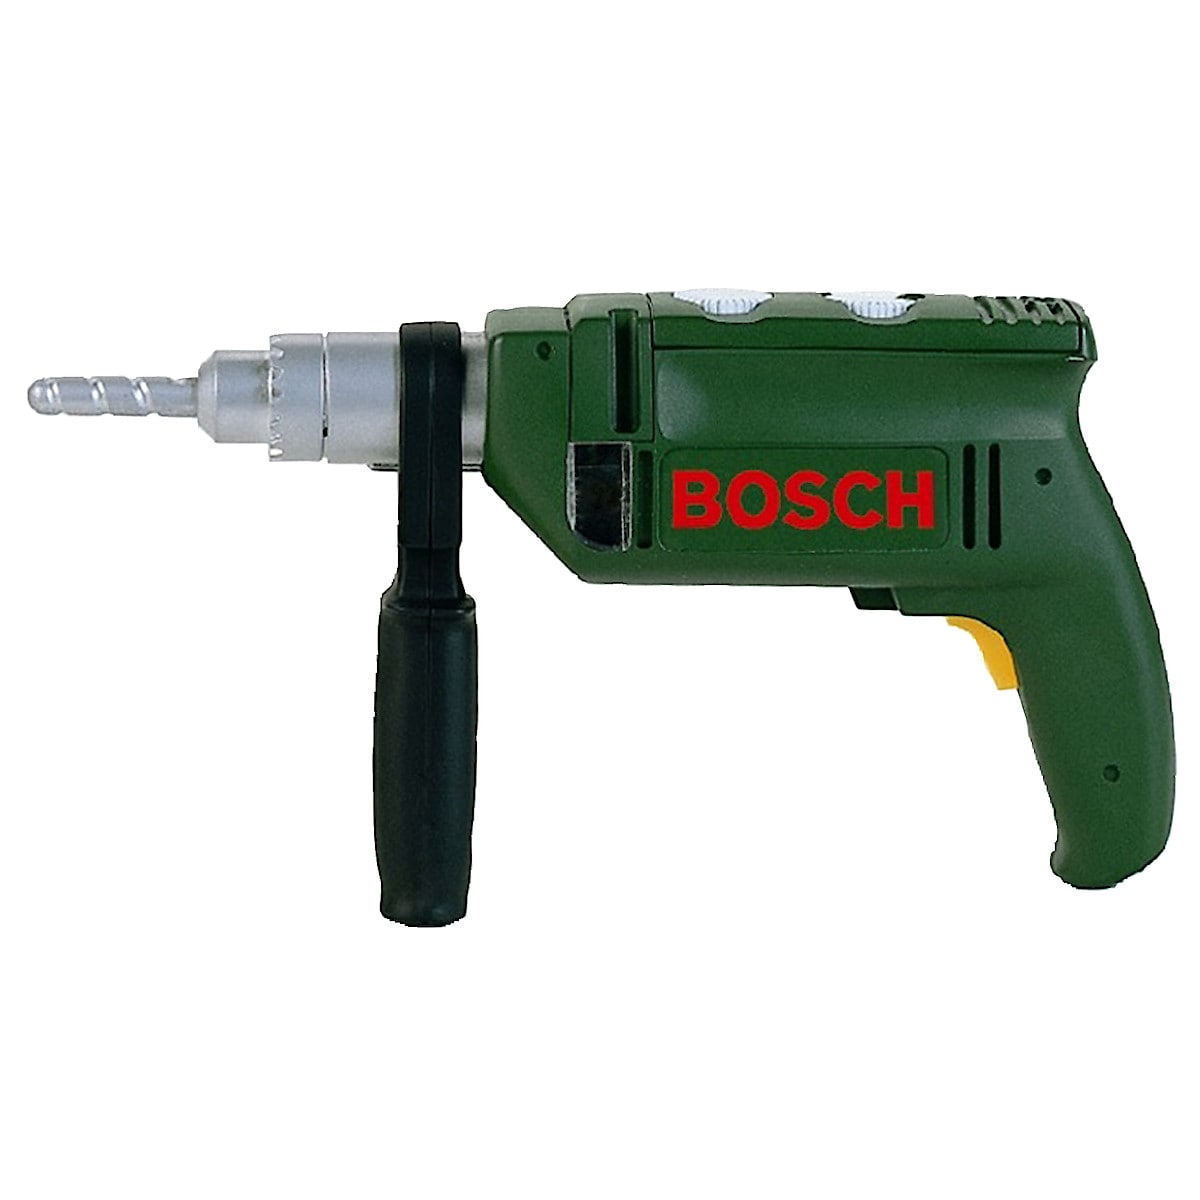 Bosch Toy Drill